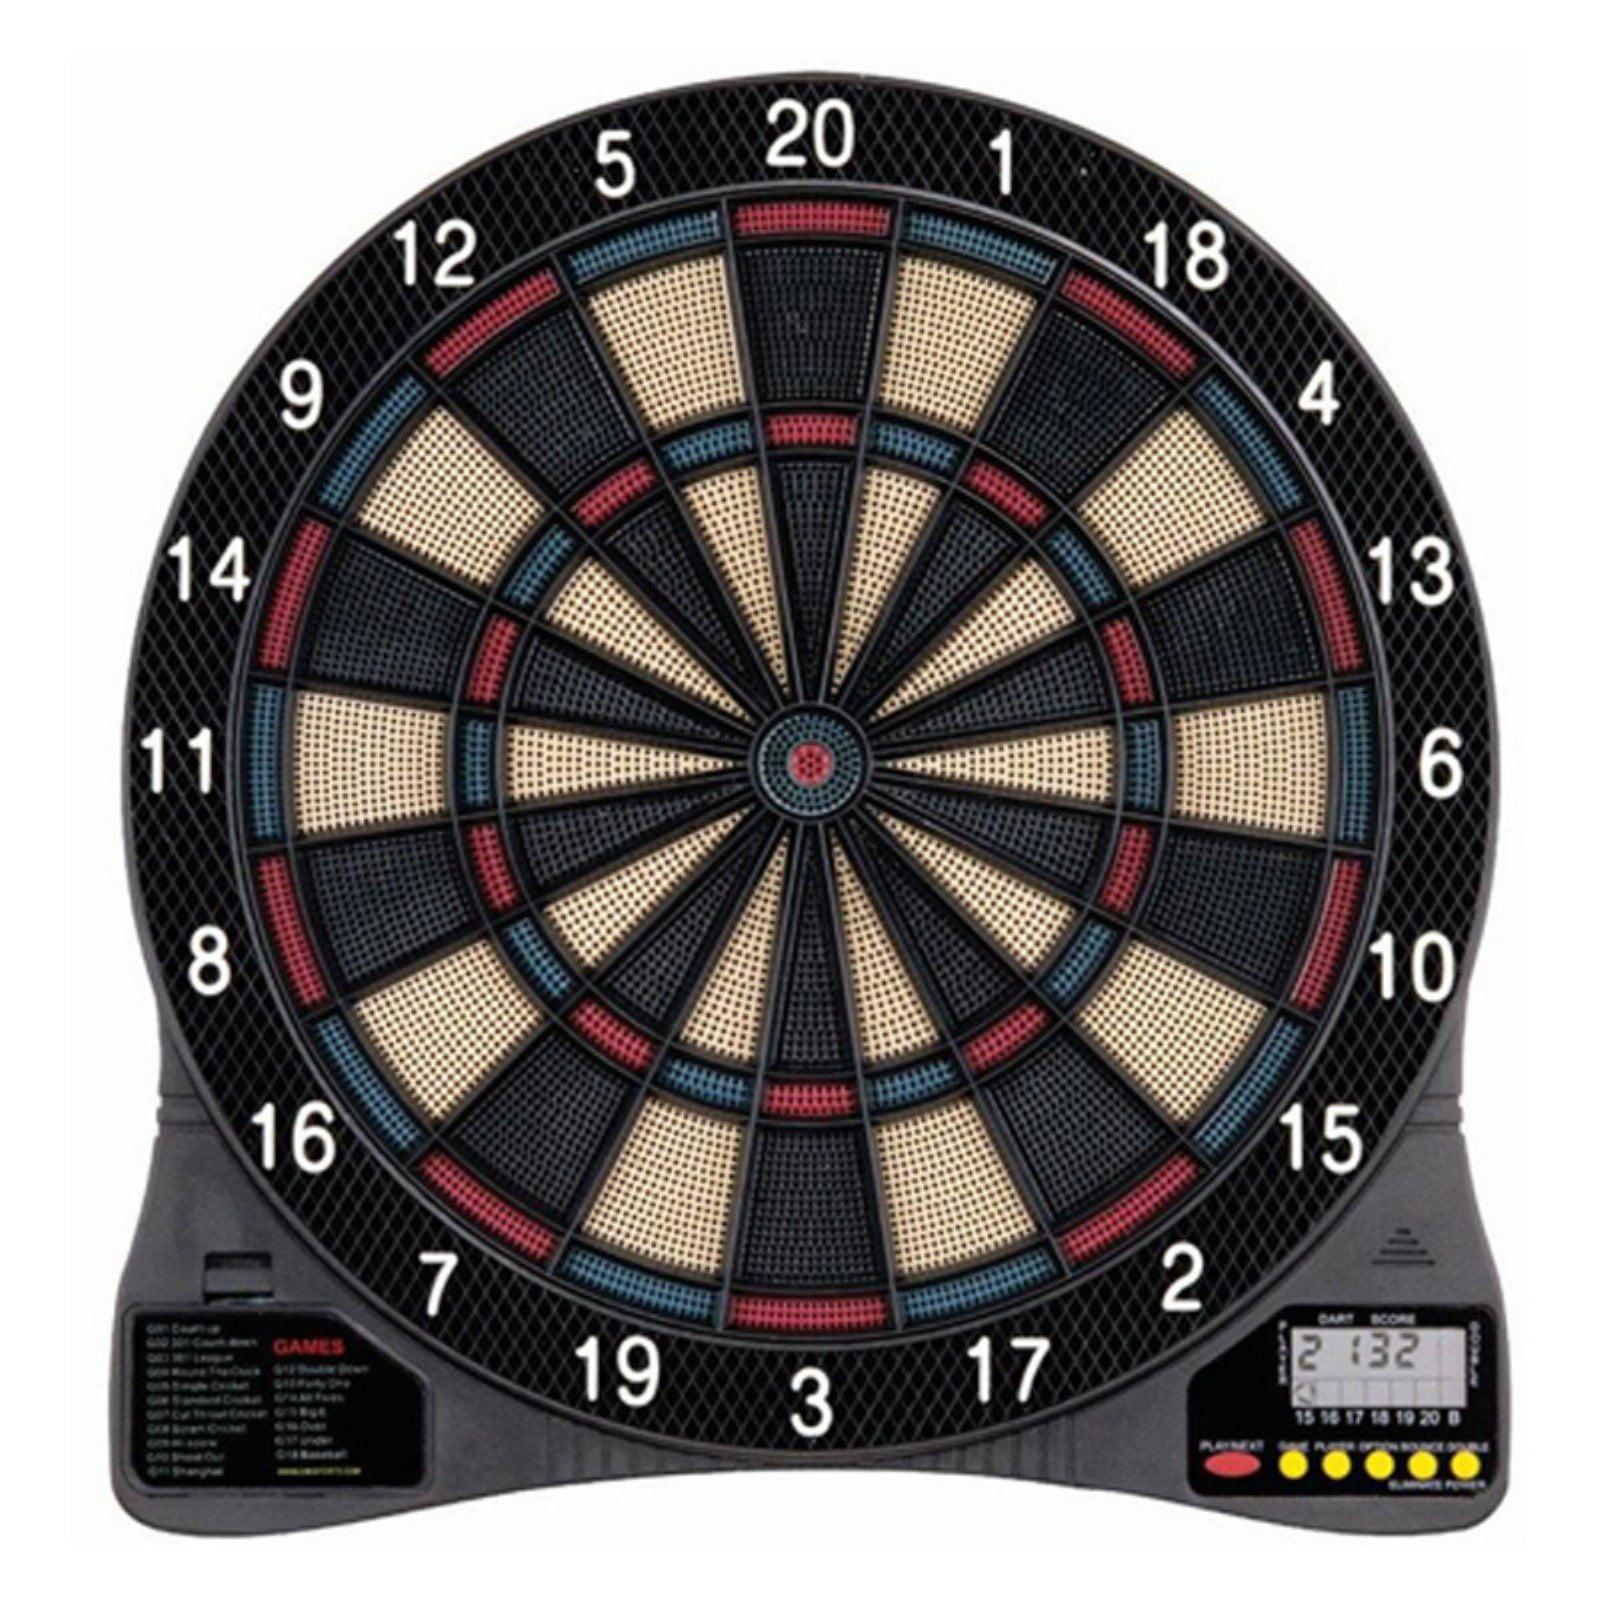 Arachnid Dartronic 100 Electronic Dartboard